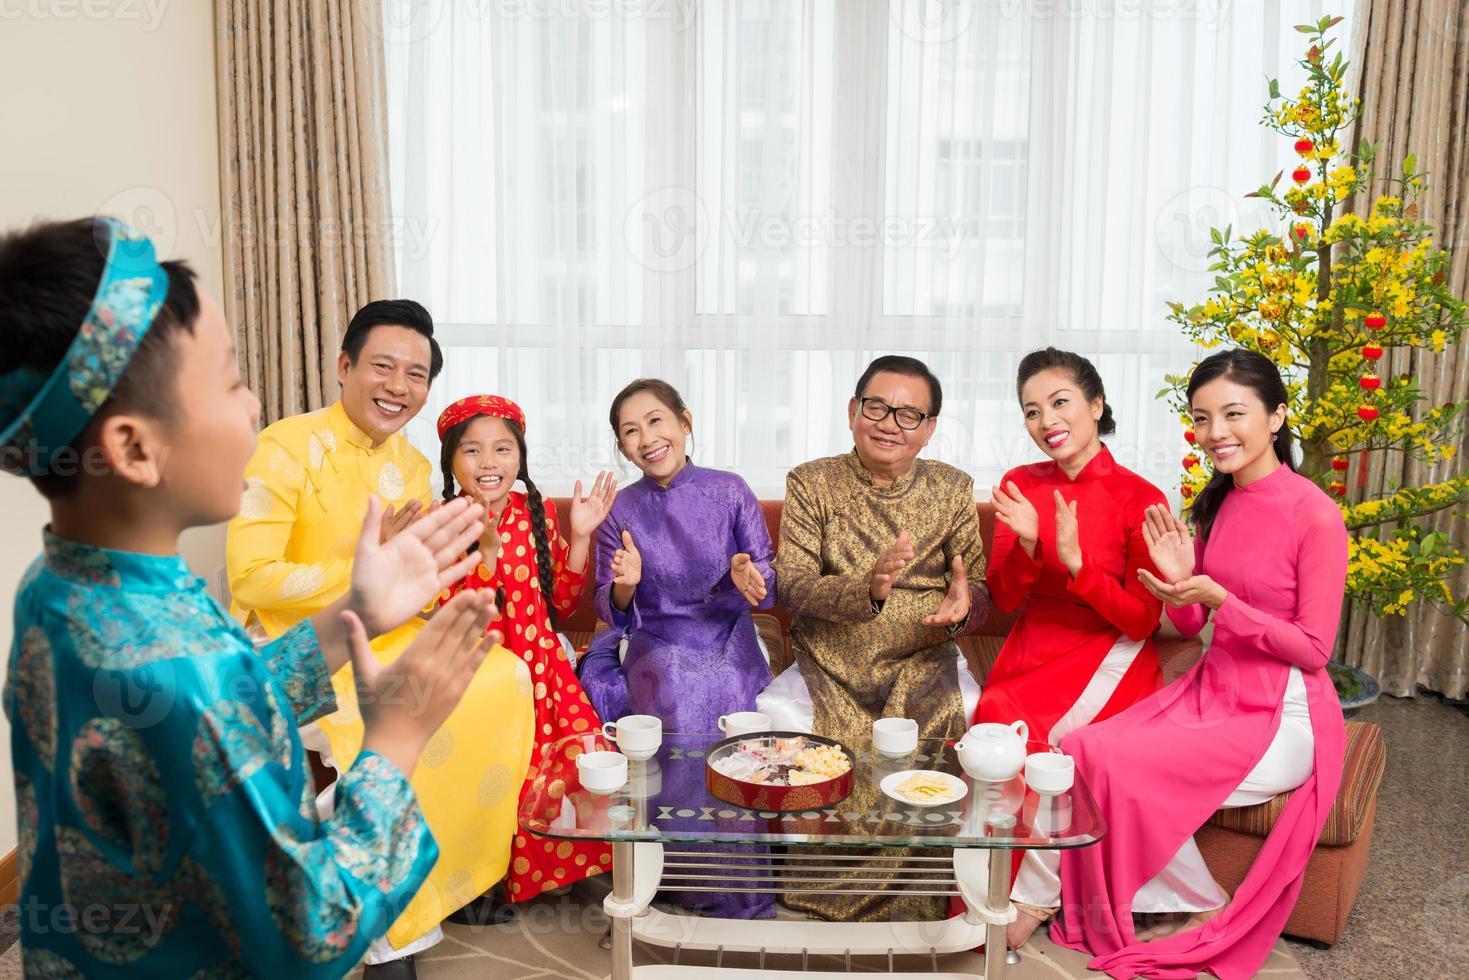 famiglia applaudente foto